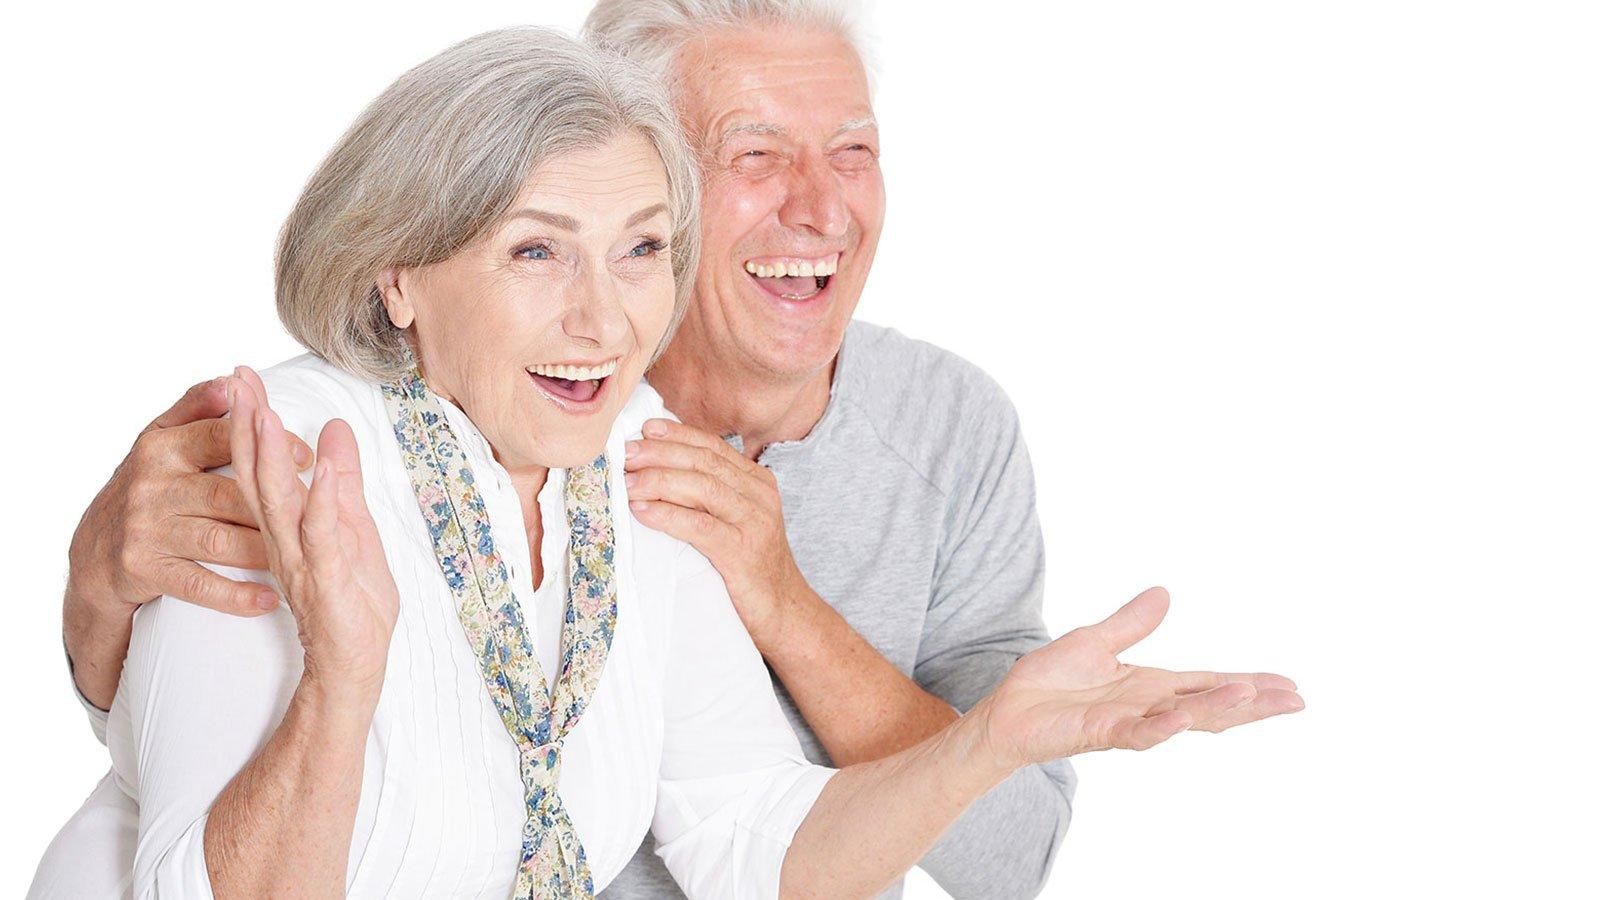 un uomo e una donna felici